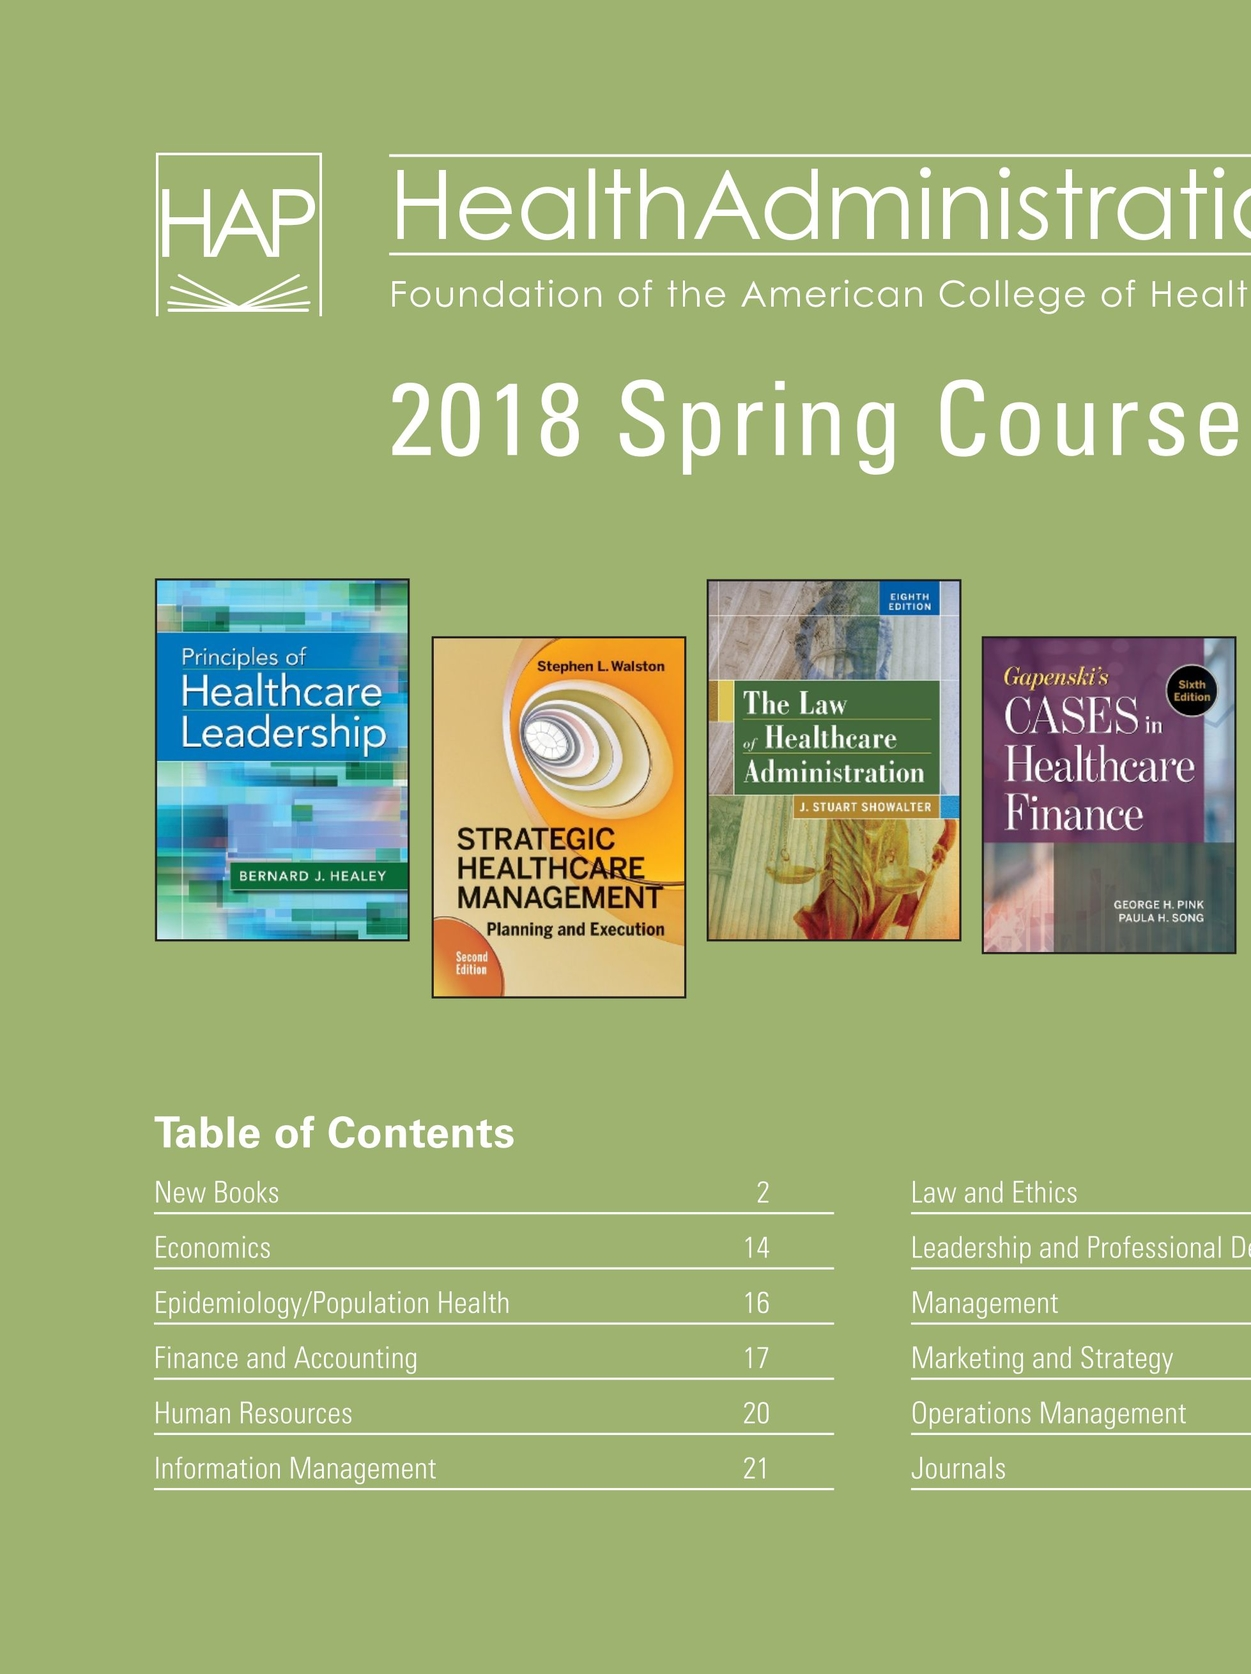 Health administration press management catalog spring 2018 cover1 health administration press management catalog spring 2018 cover1 cover2 fandeluxe Choice Image